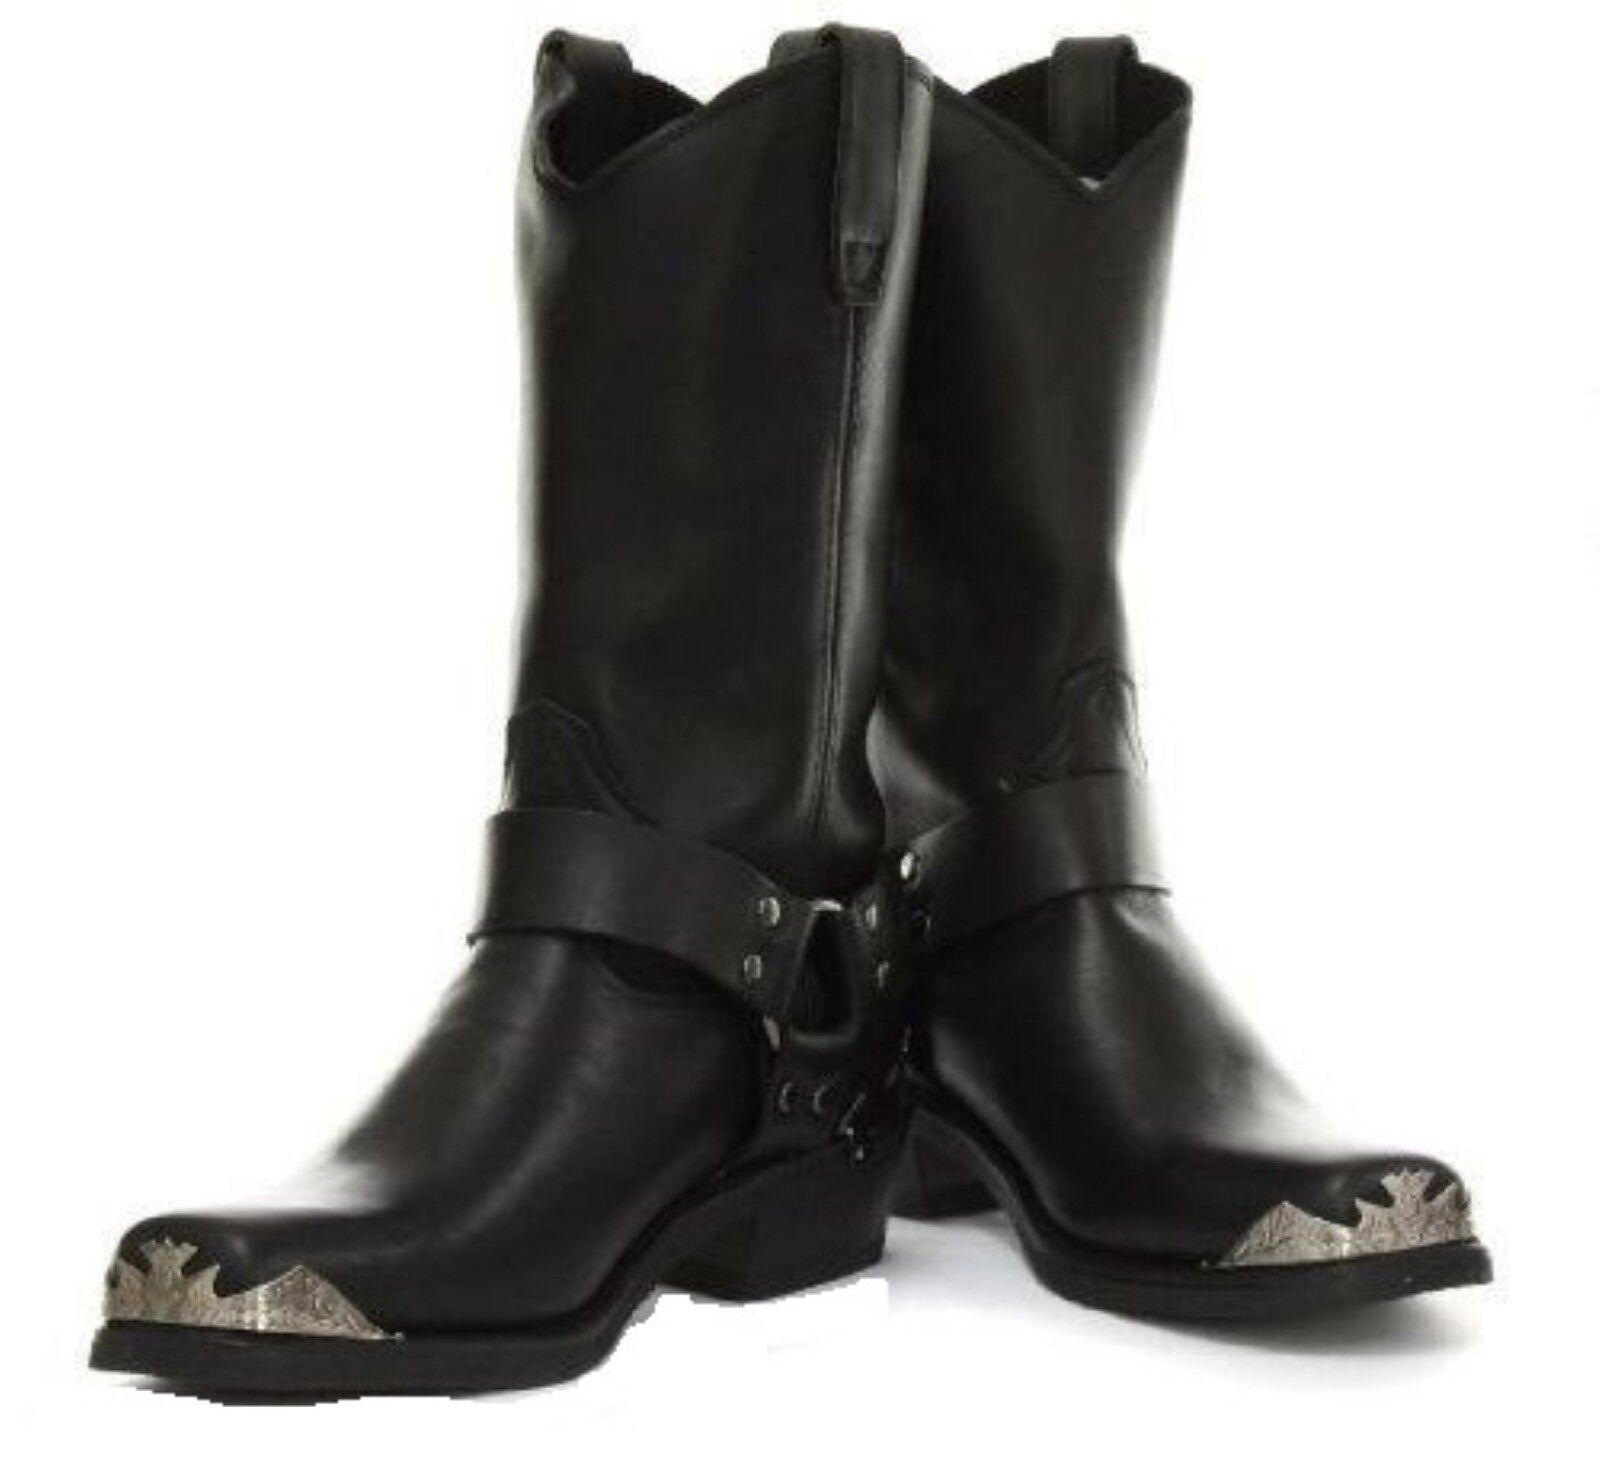 Grinders Rare Eagle High Cowboy Biker Black Leather Boots Western Unisex